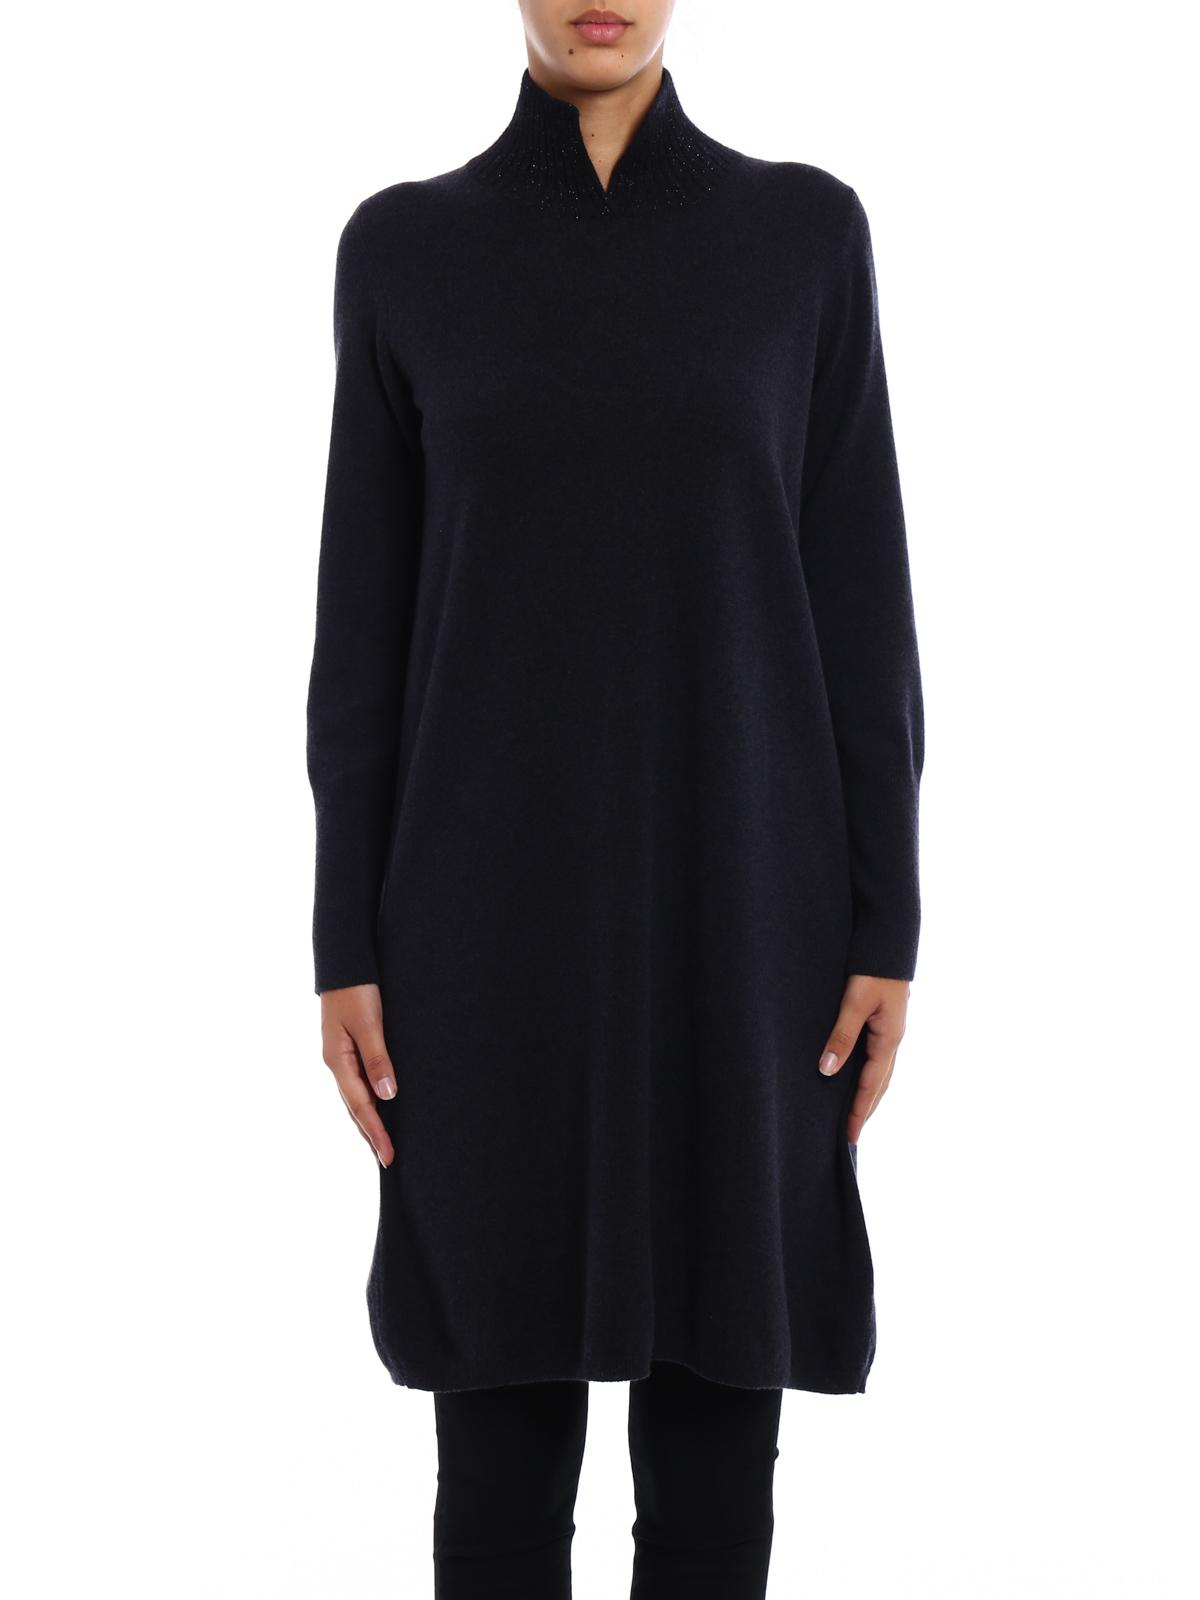 Straight Line Artrage : Straight line design knitted dress by fabiana filippi